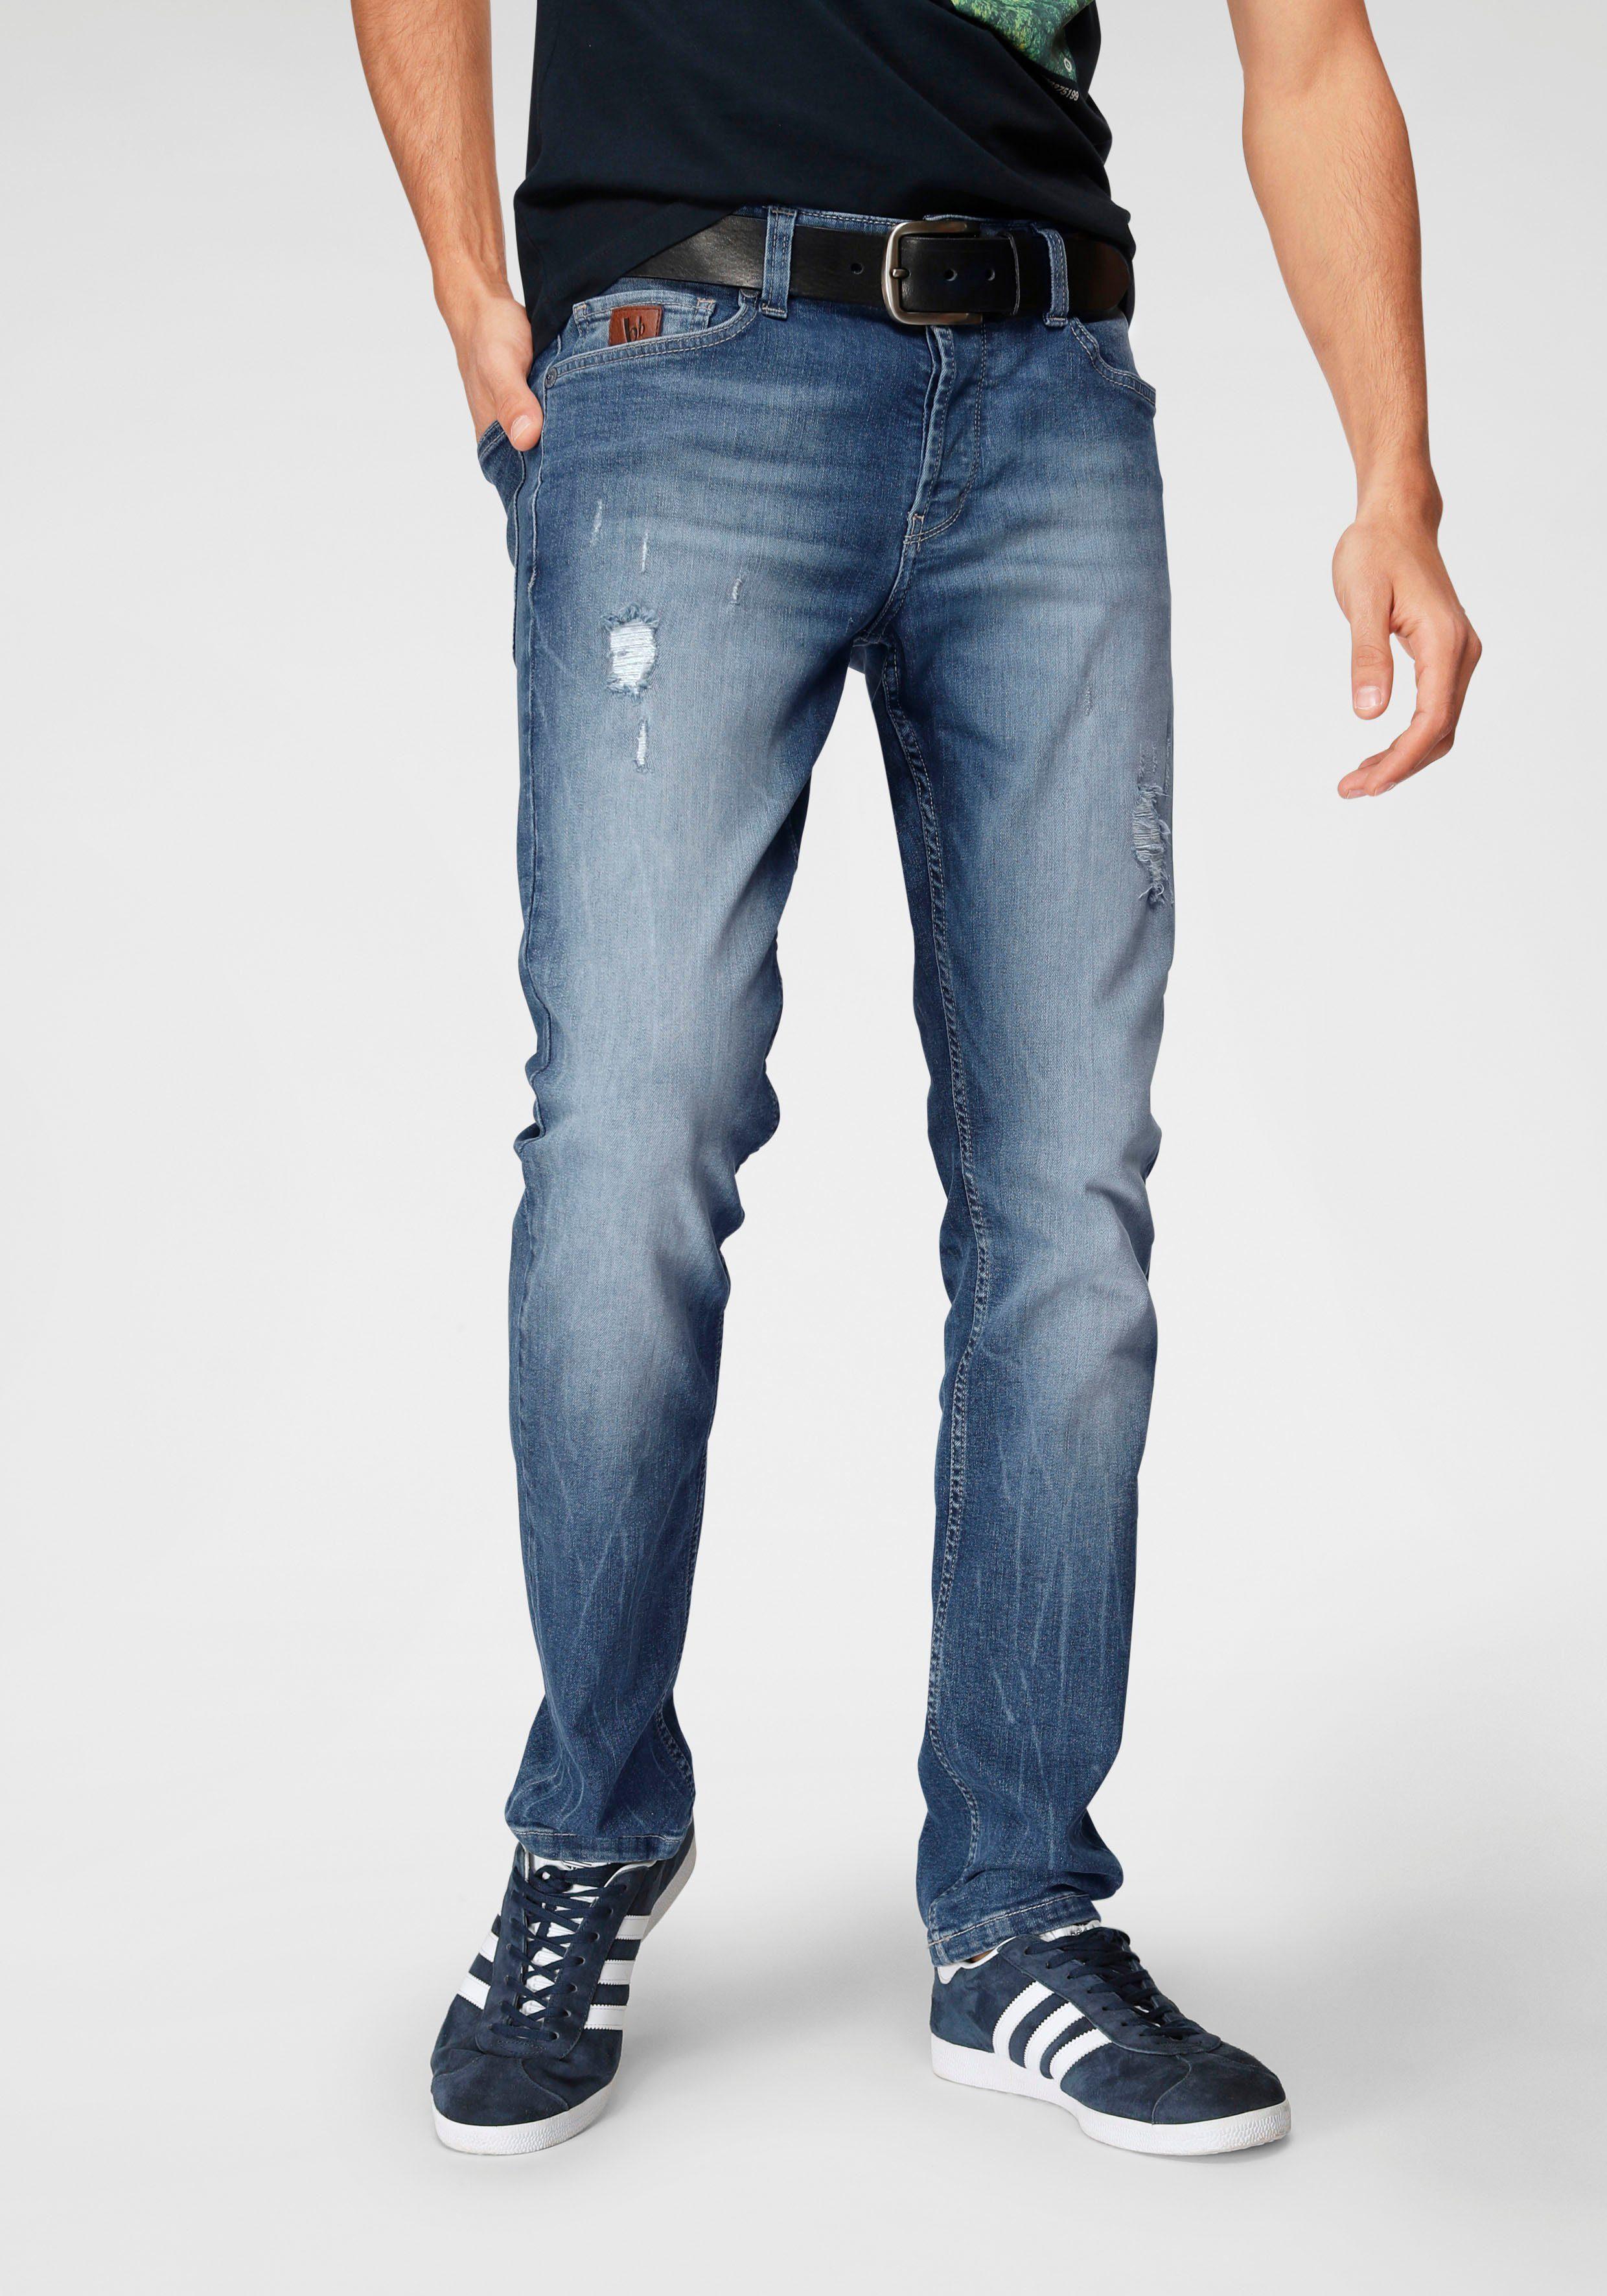 404 Sheego pantalon stretch schlupfhose taille 48 court